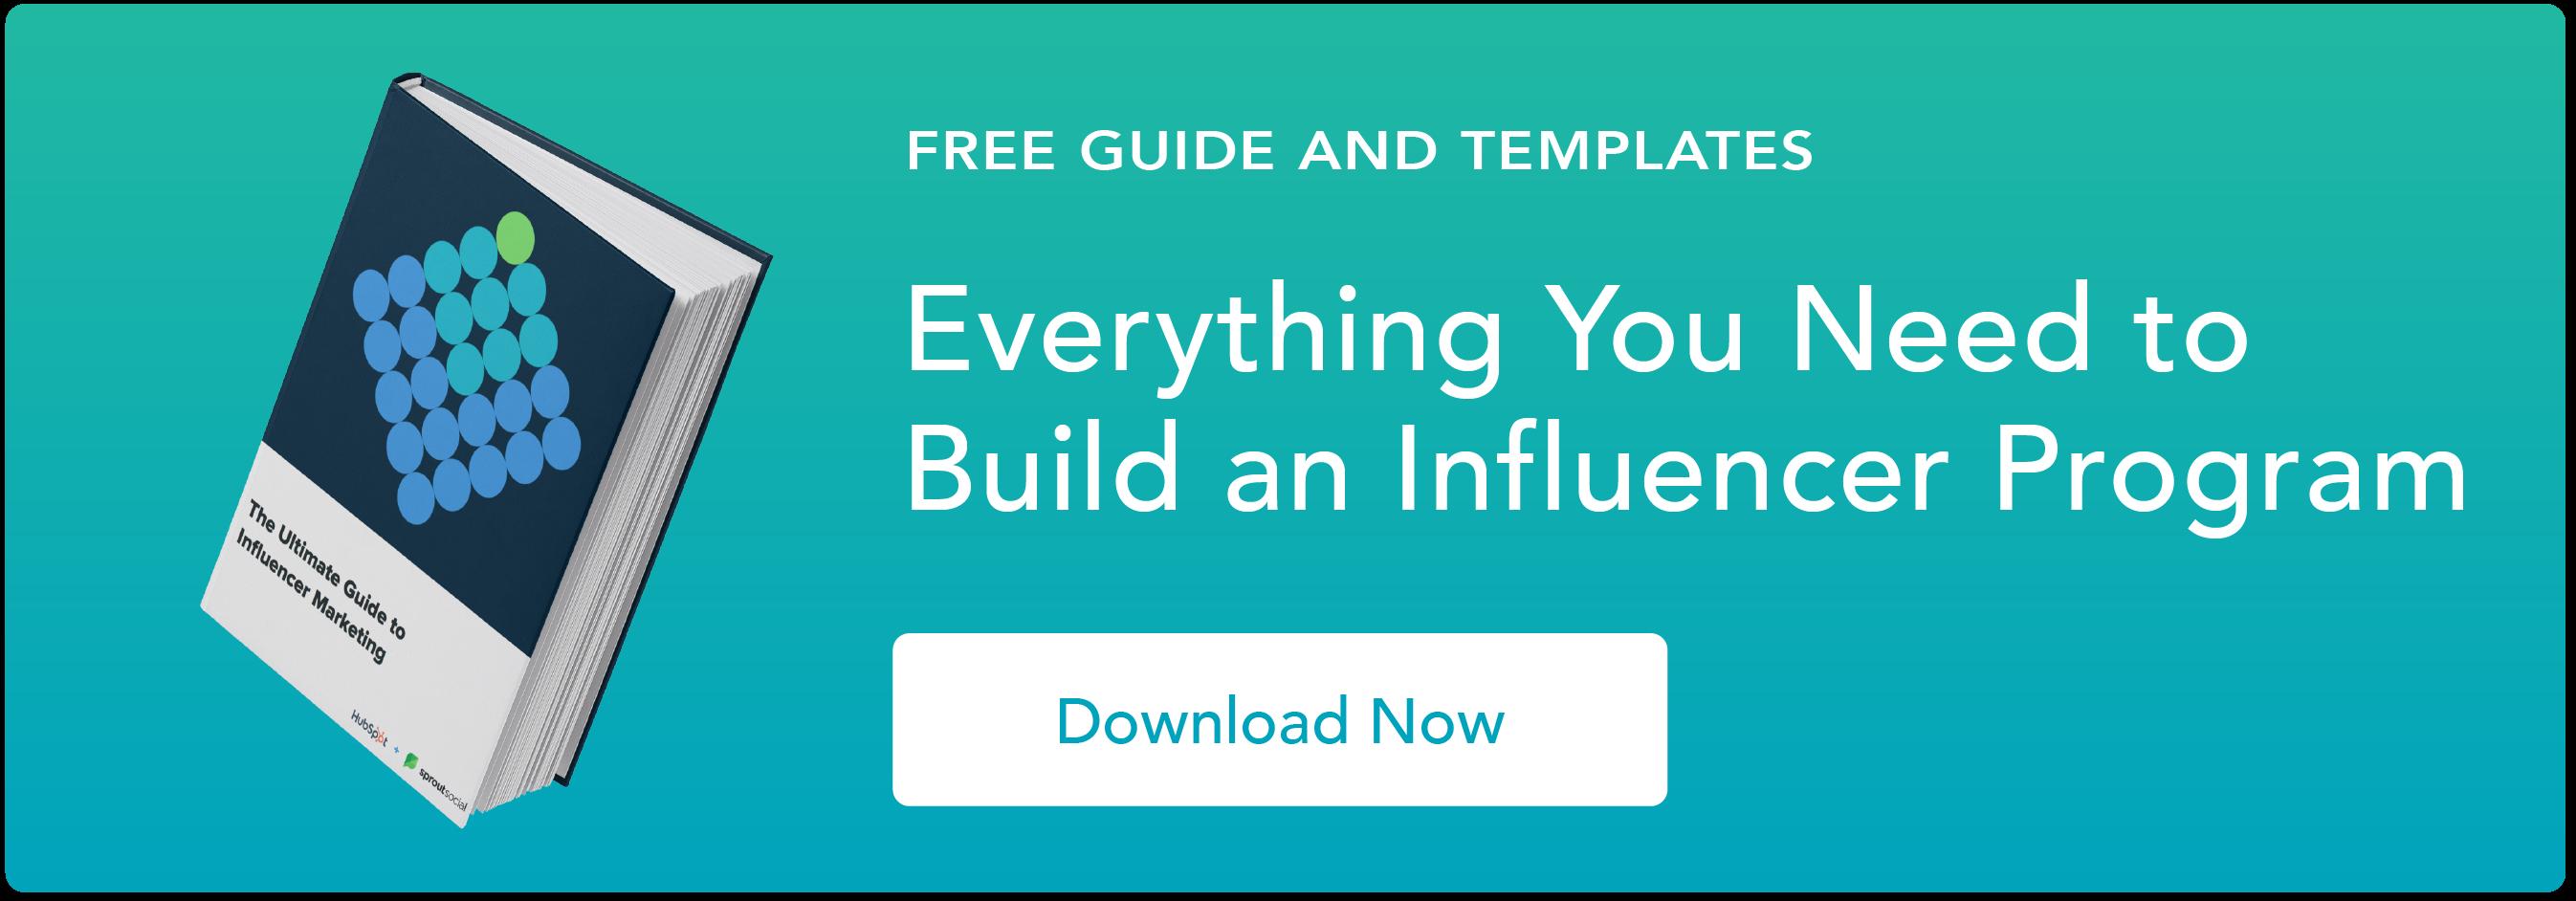 influencer idee di marketing